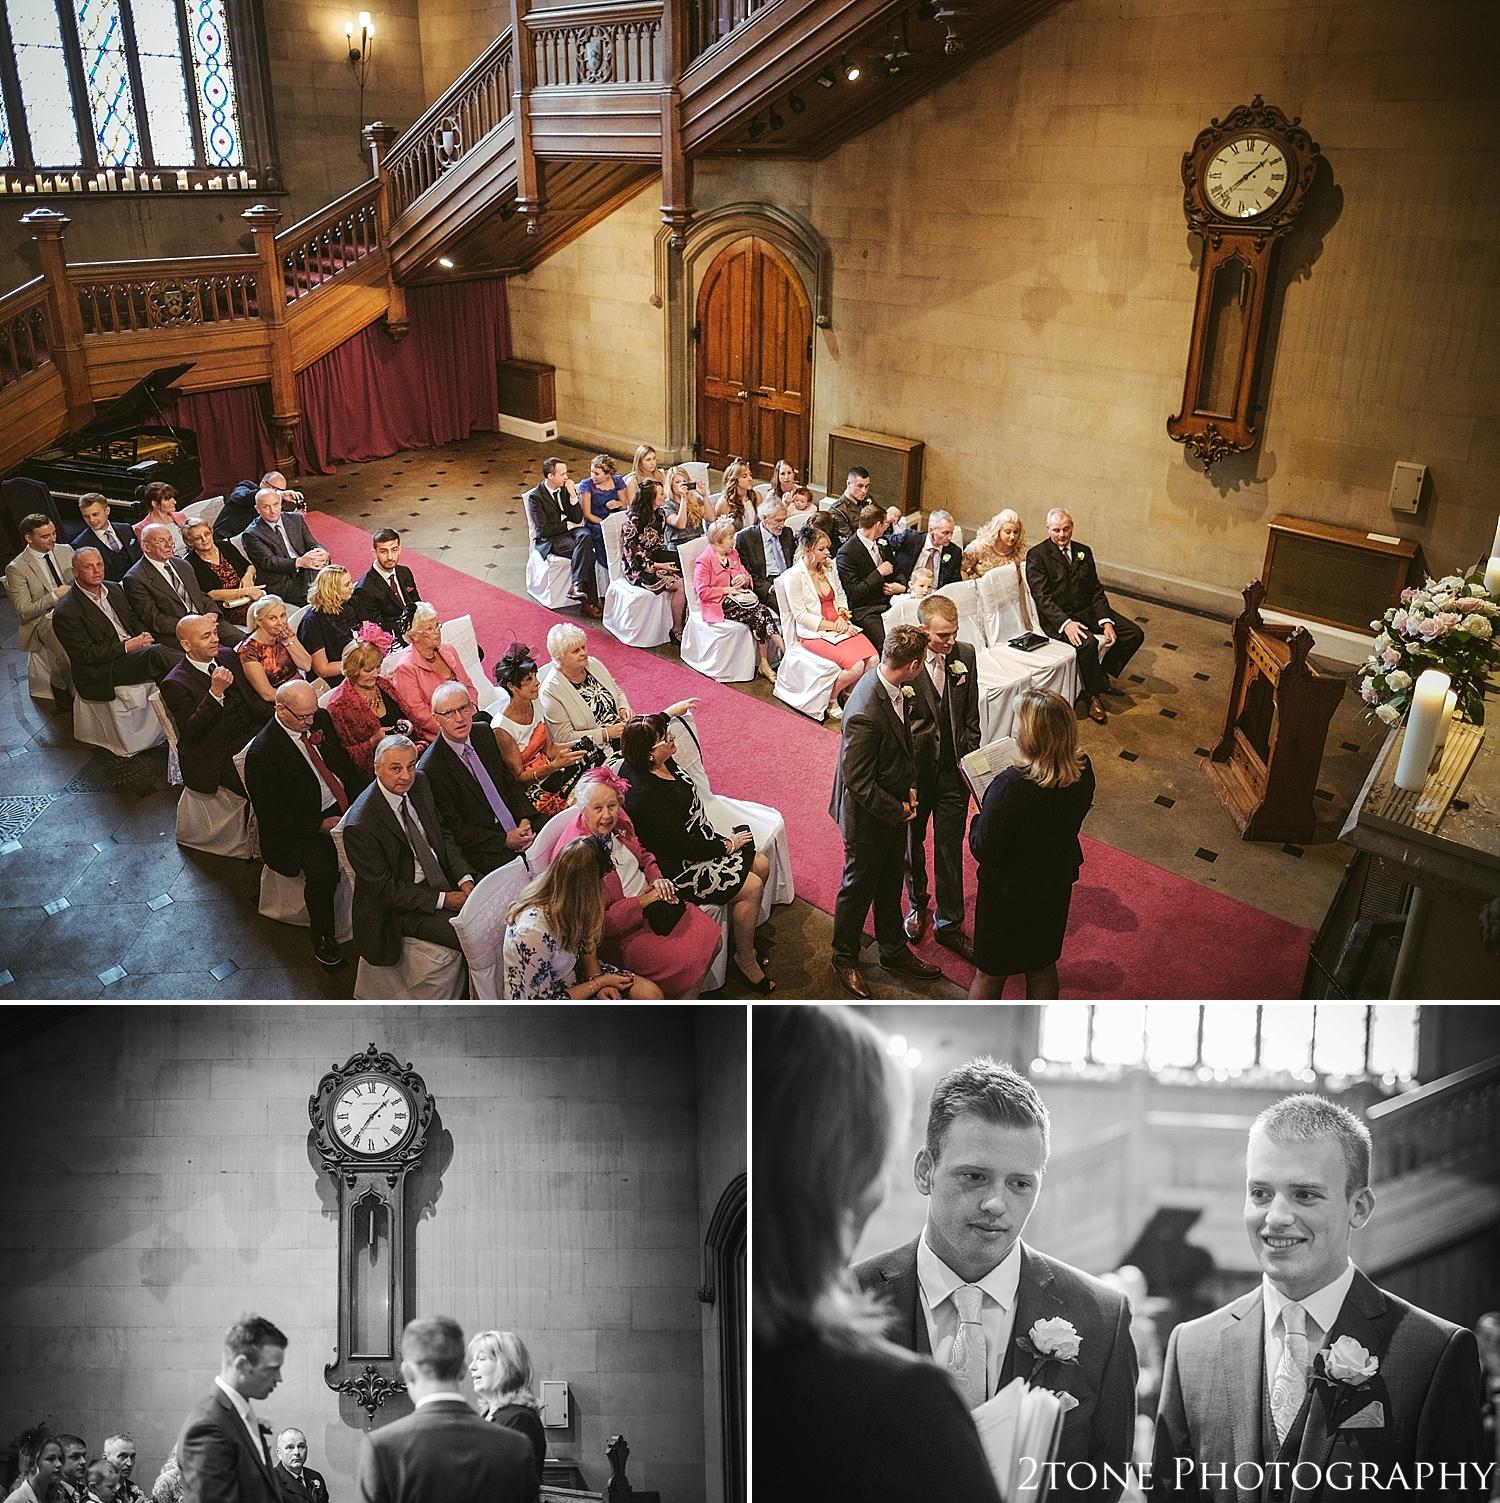 The Great Hall wedding ceremony.  Matfen Hall by Durham based wedding photographers 2tone Photography